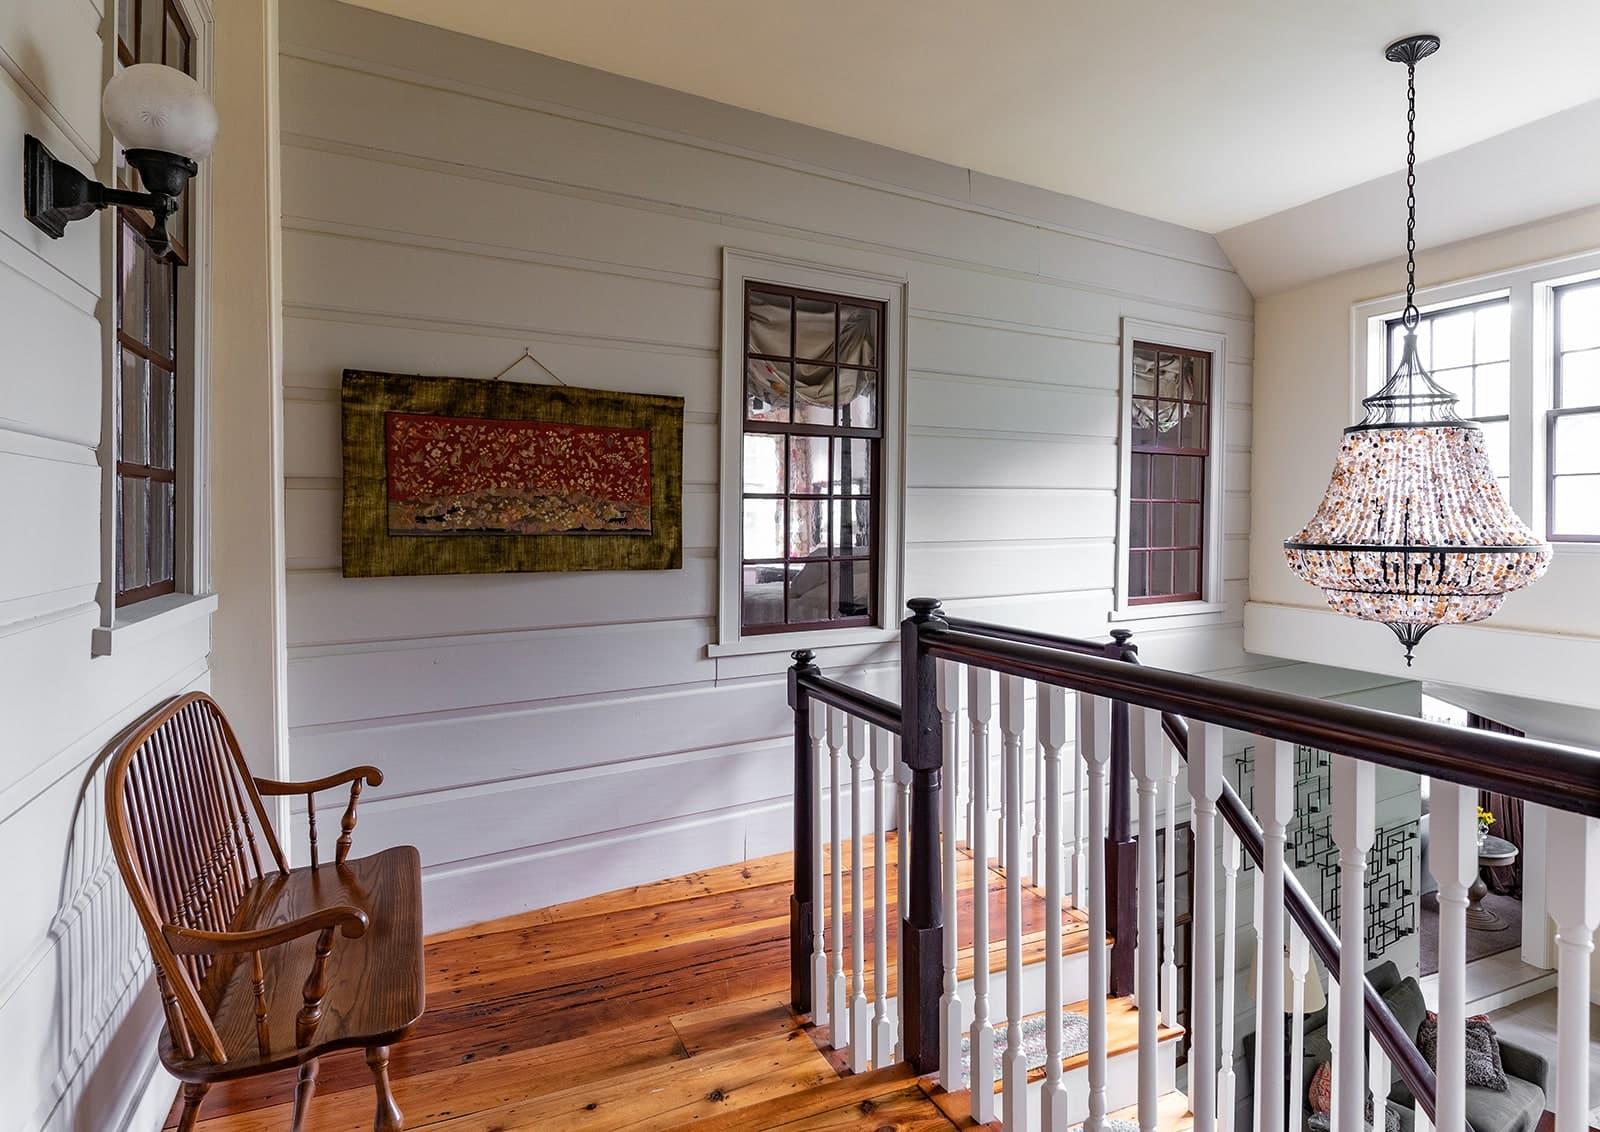 Day Dodge House Ipswich MA Historic Hallway Stairs